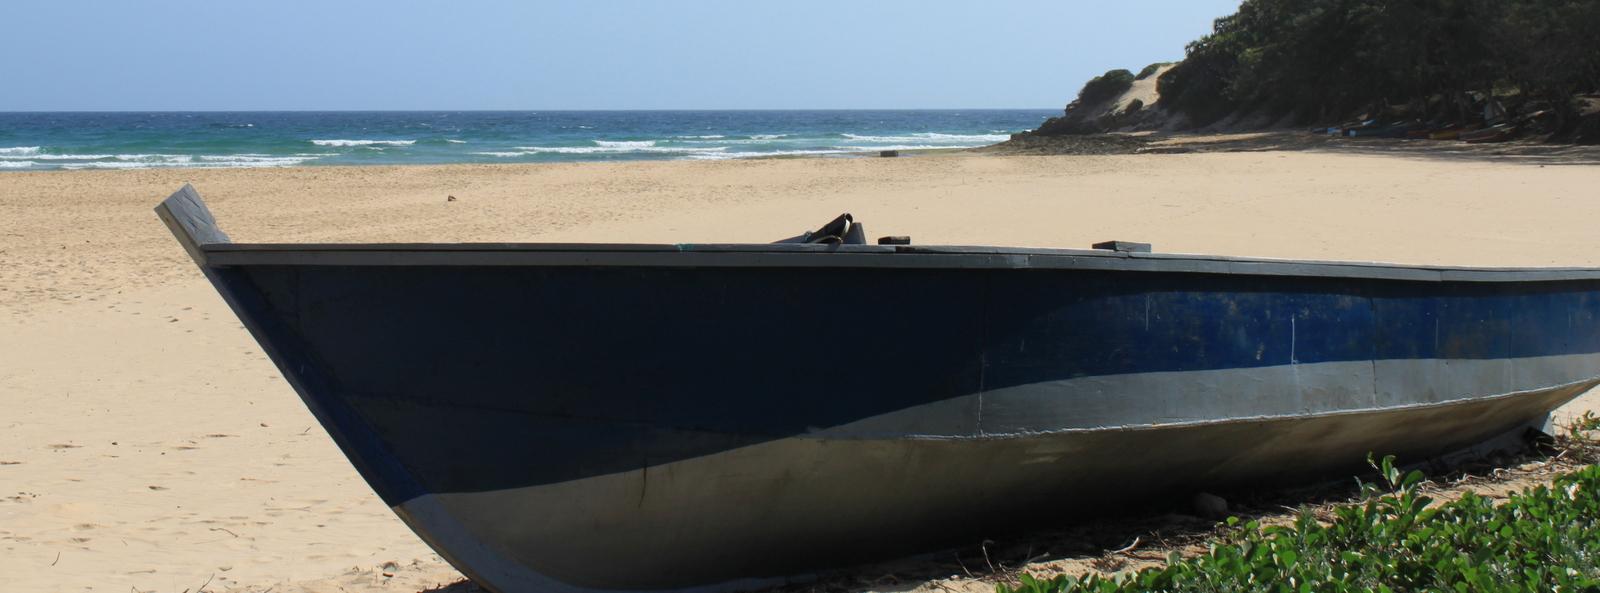 Tofu Beach, Mozambique